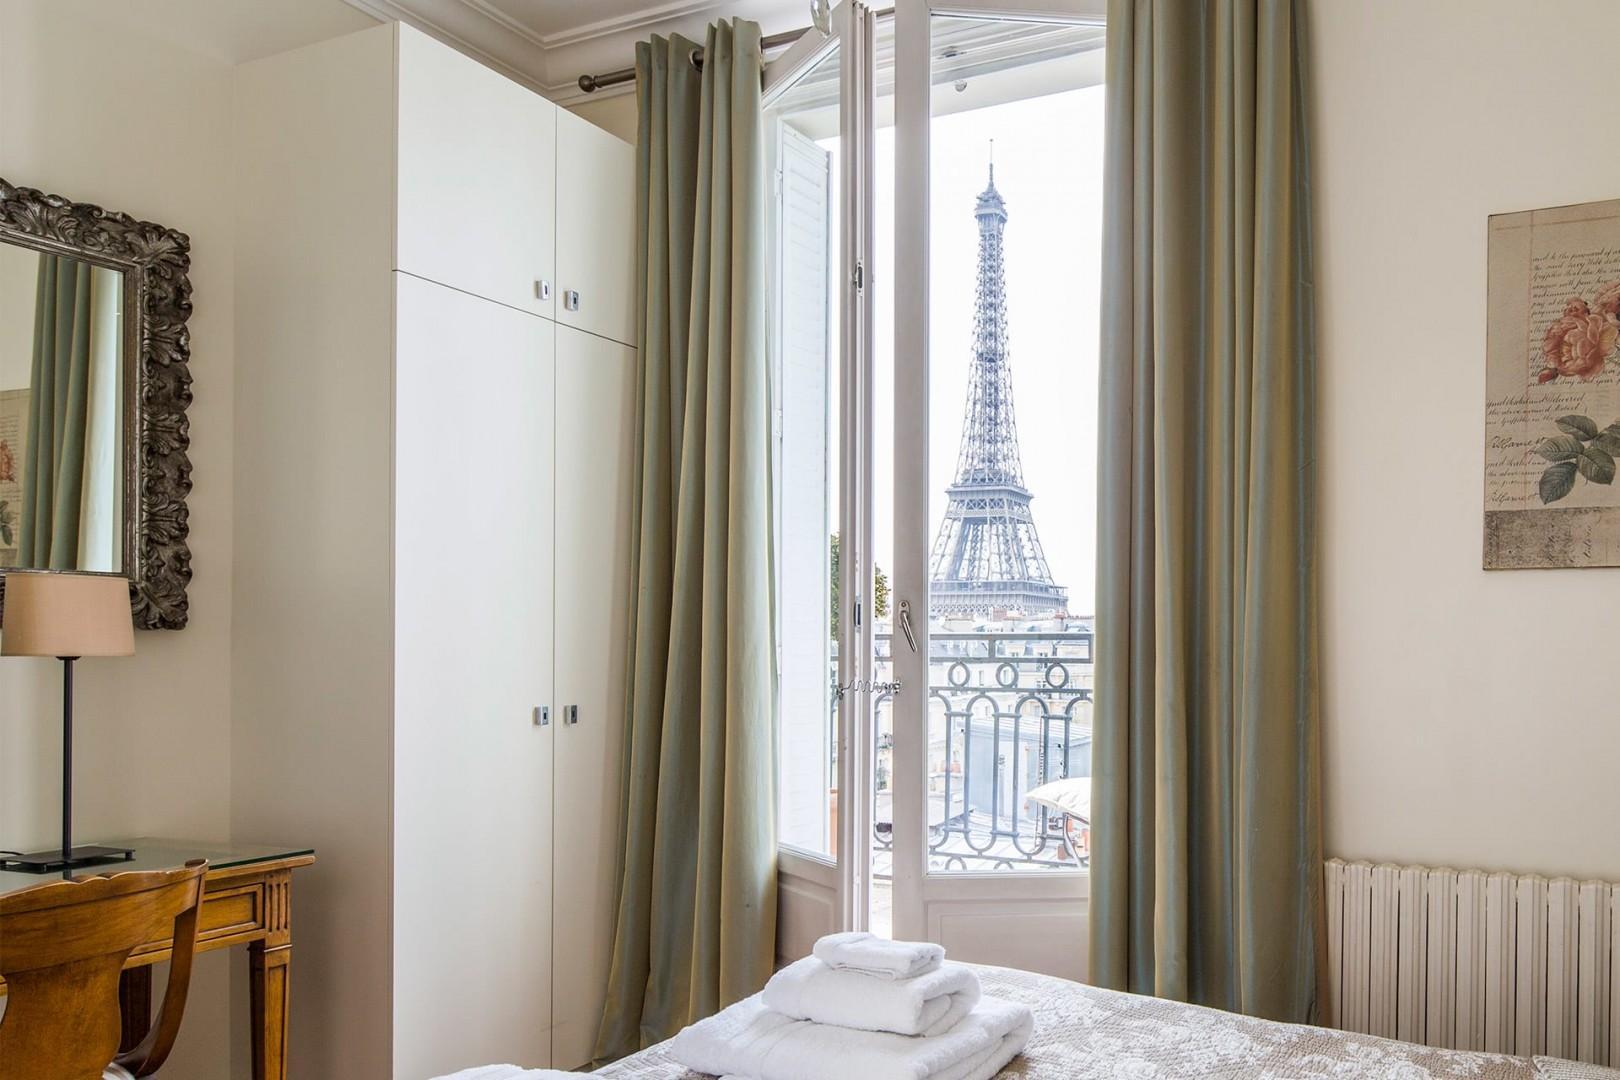 Wake up each morning to glorious views of Paris.